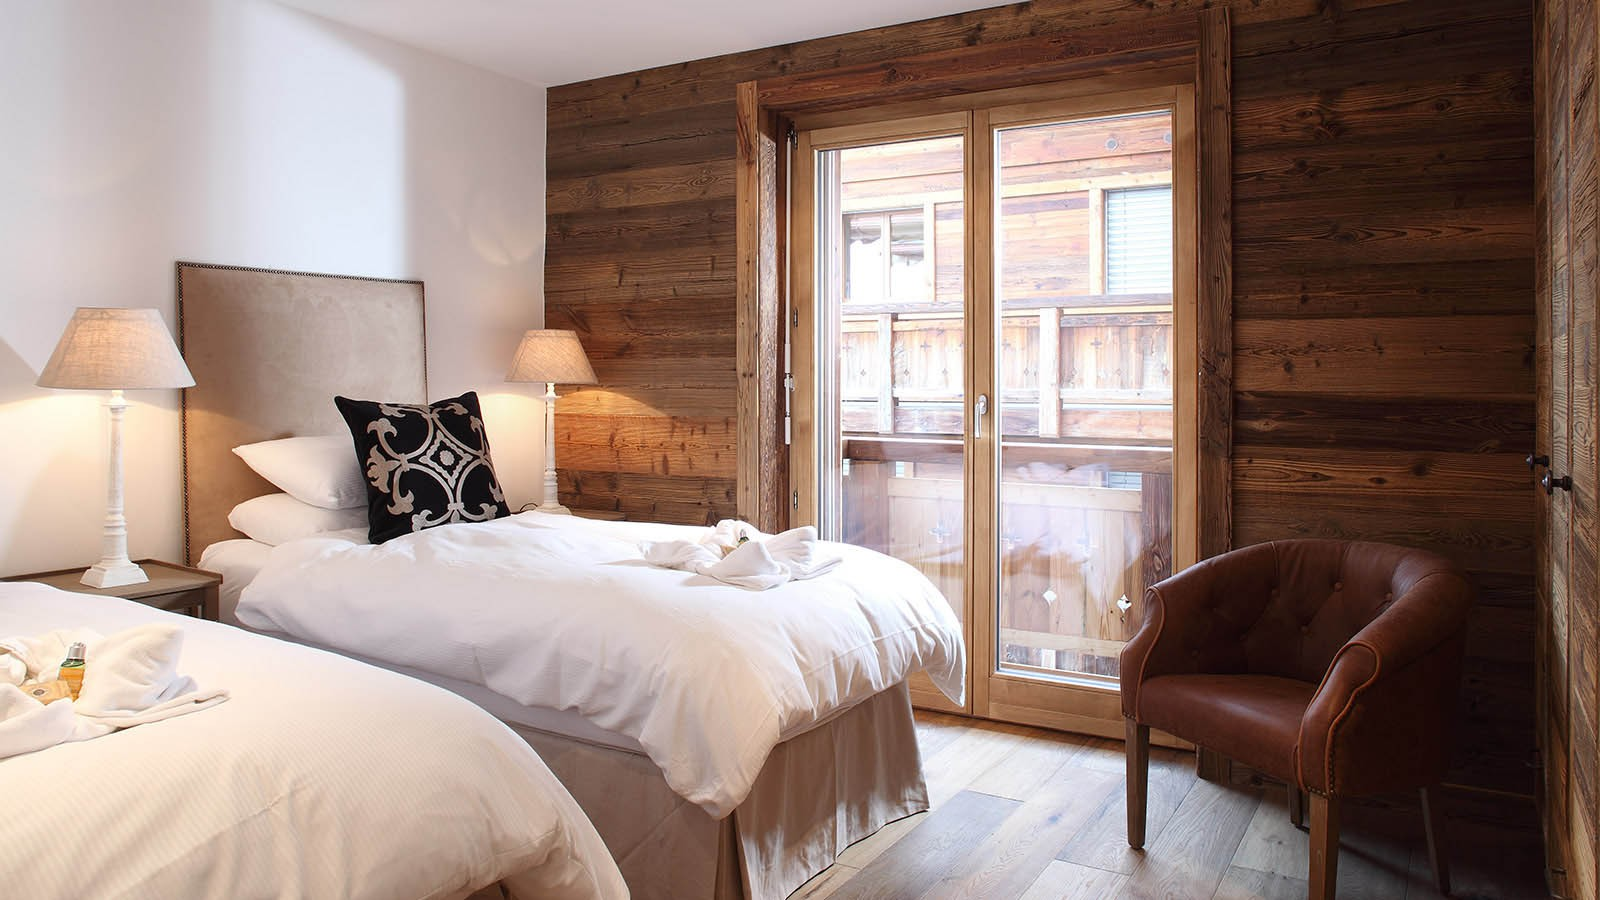 Bedroom in chalet Rosablanche, Nendaz